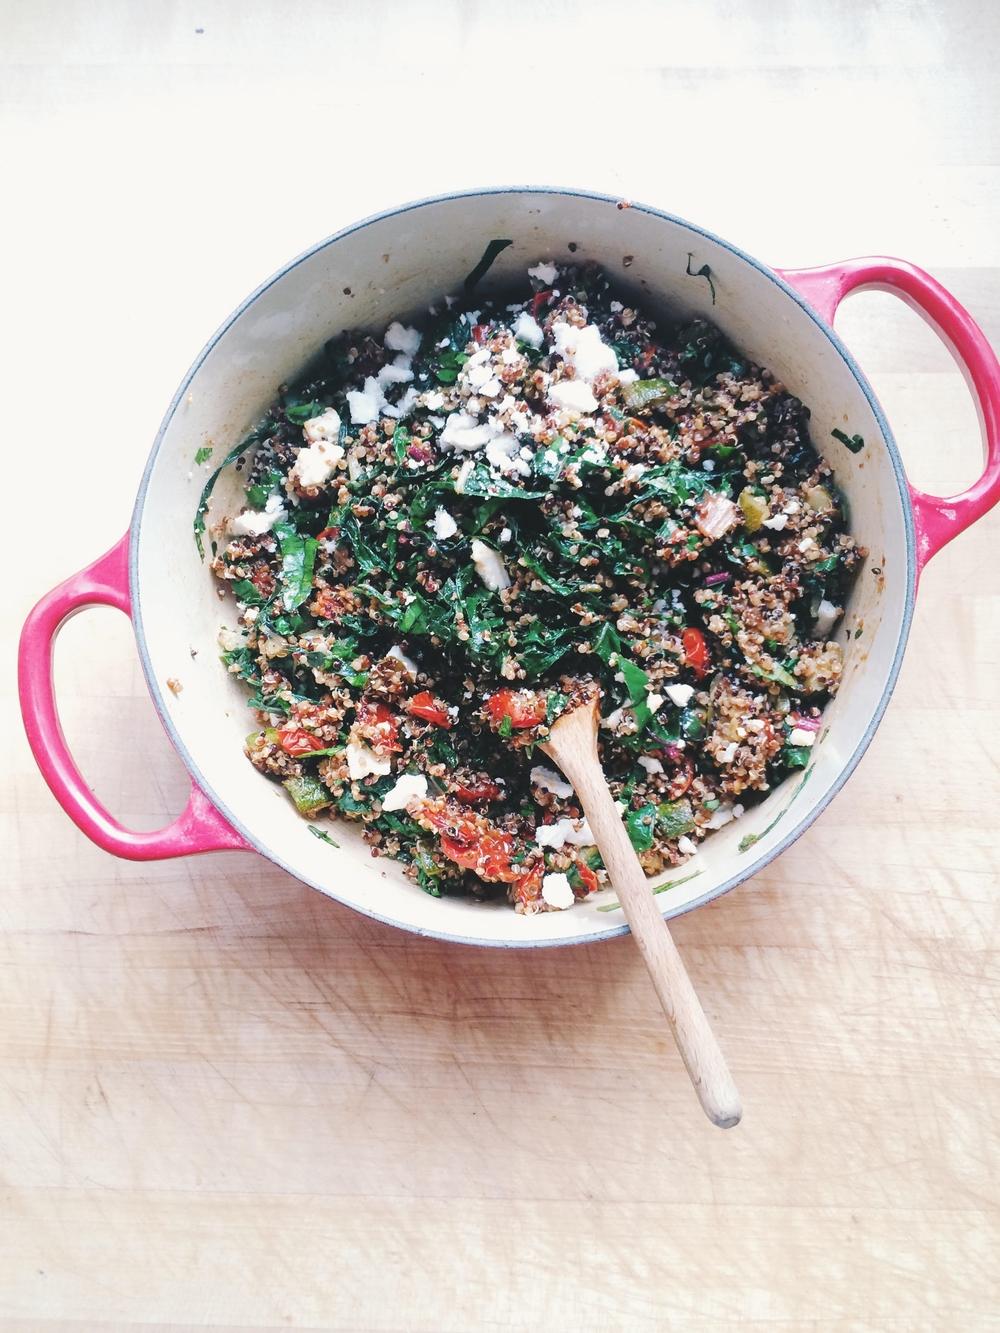 Quinoa Salad with Homemade Harissa   Eat This Poem